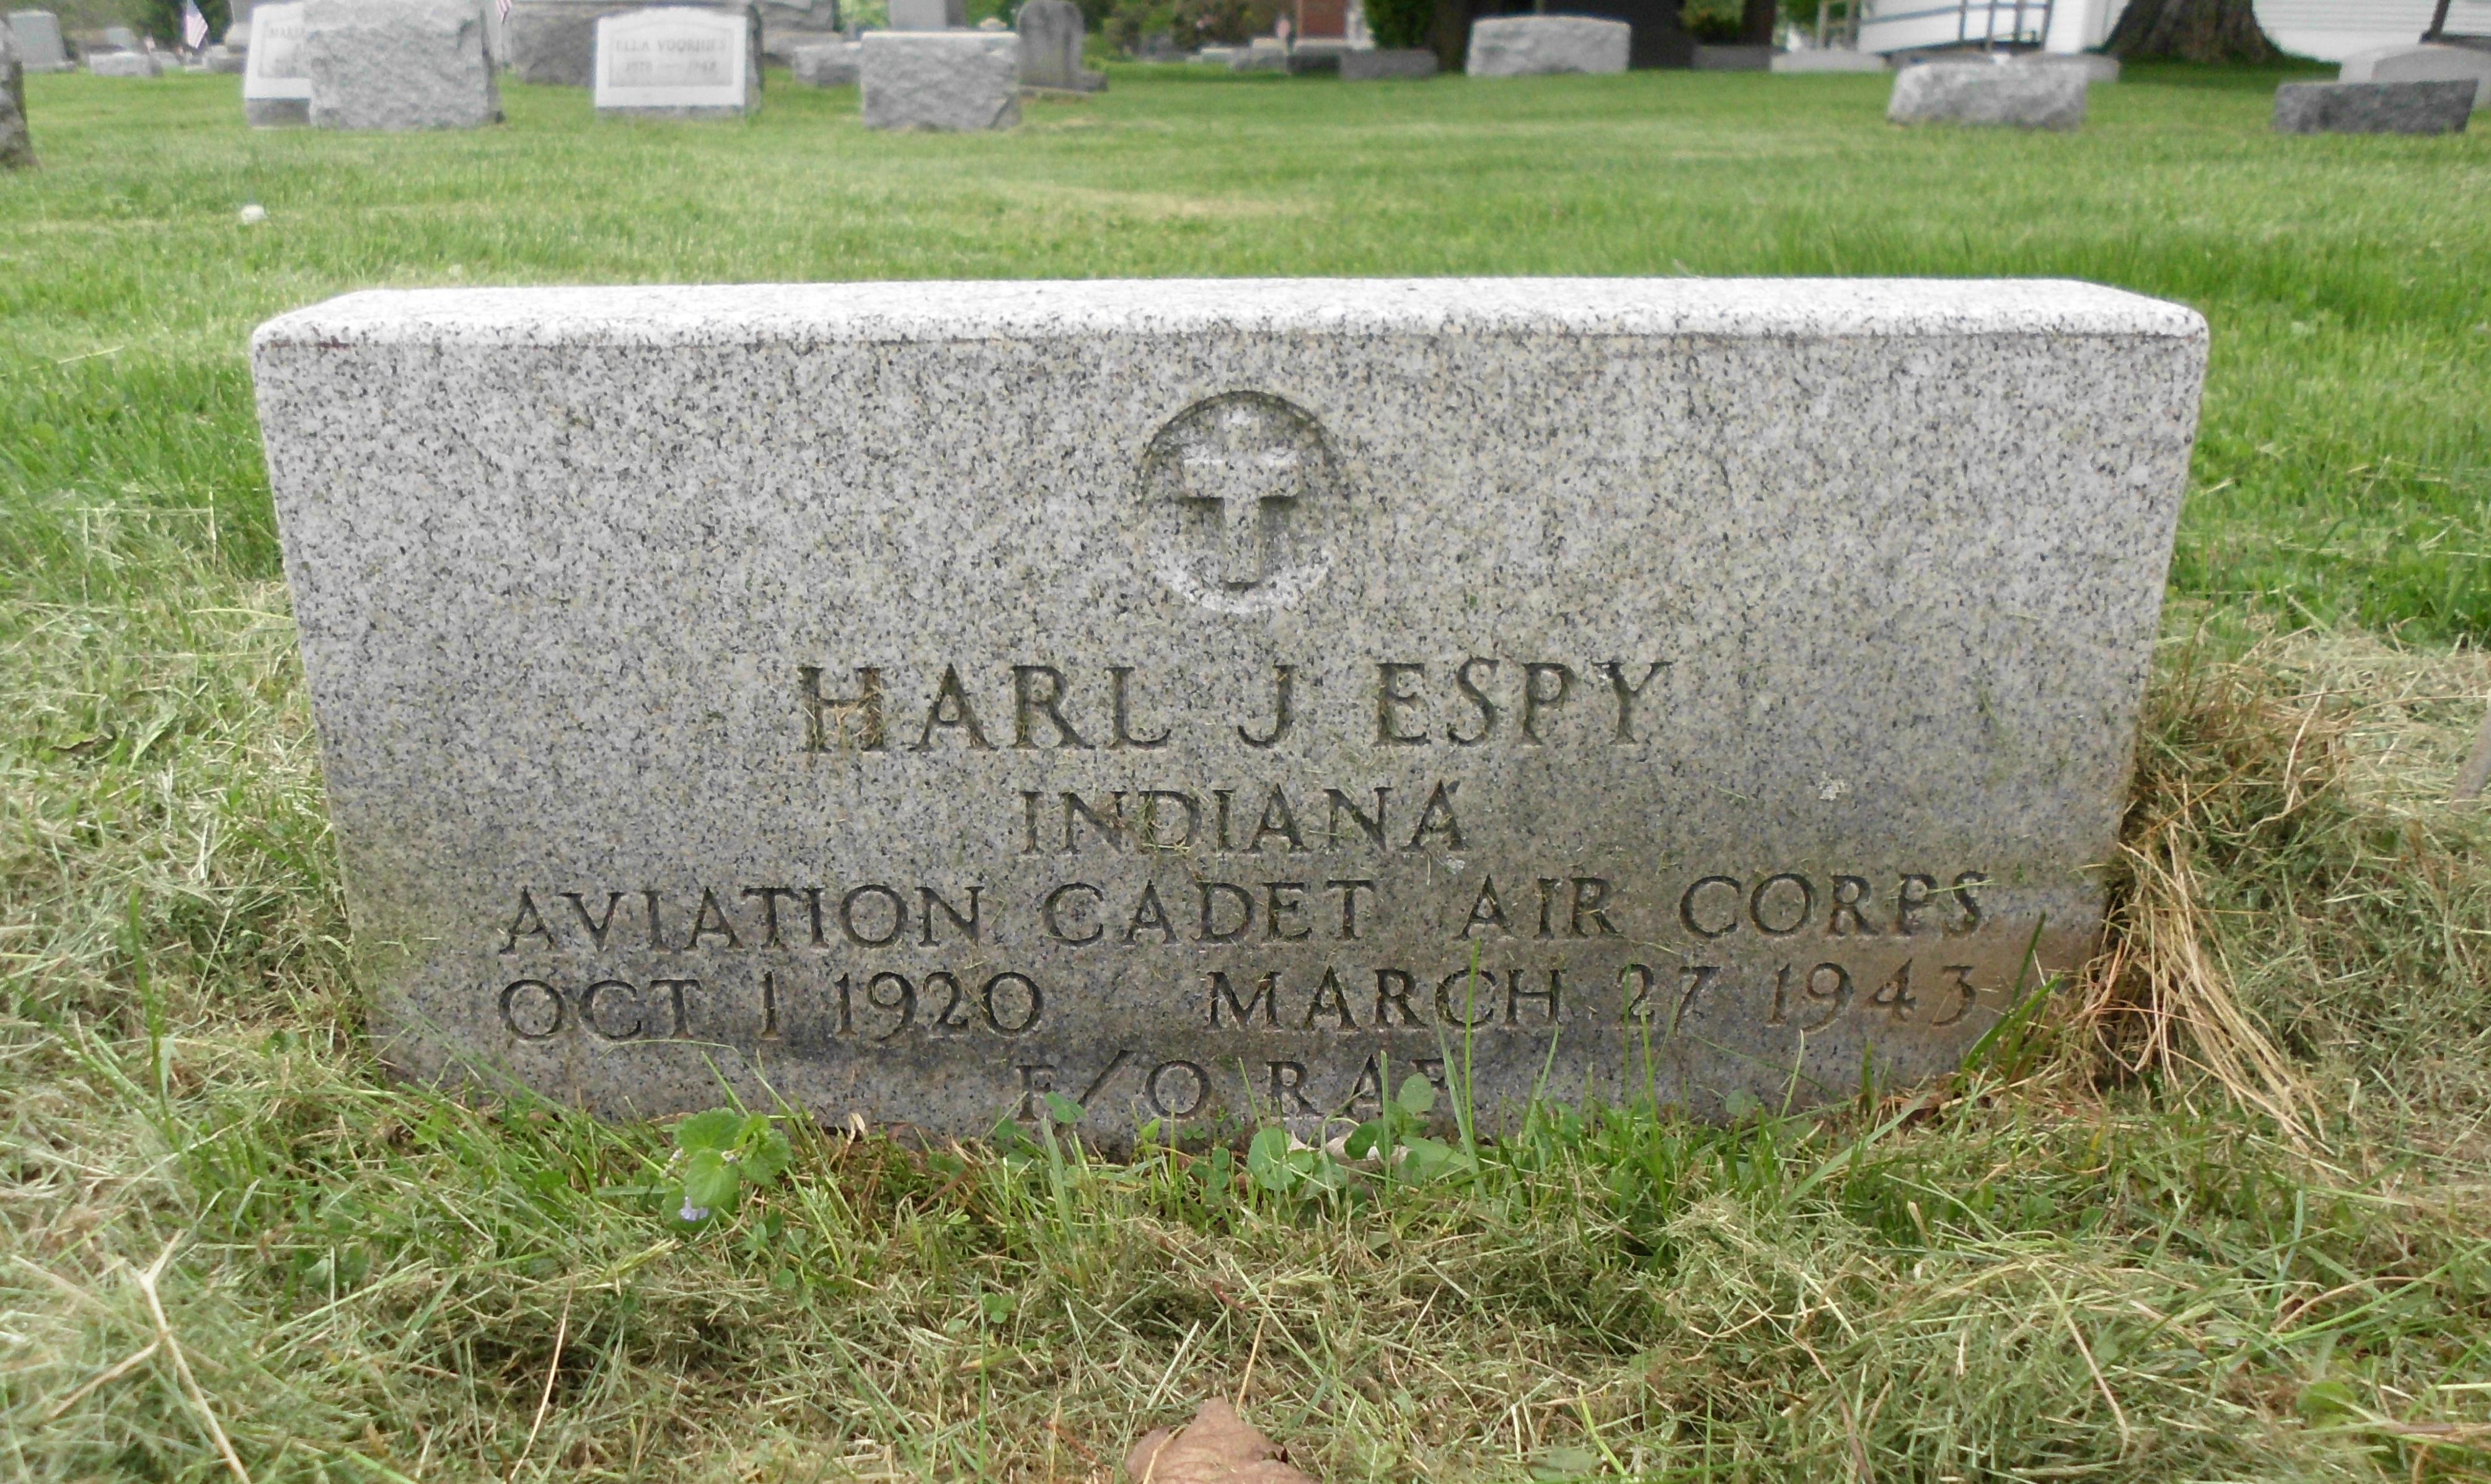 Espy HJ [Findagrave]